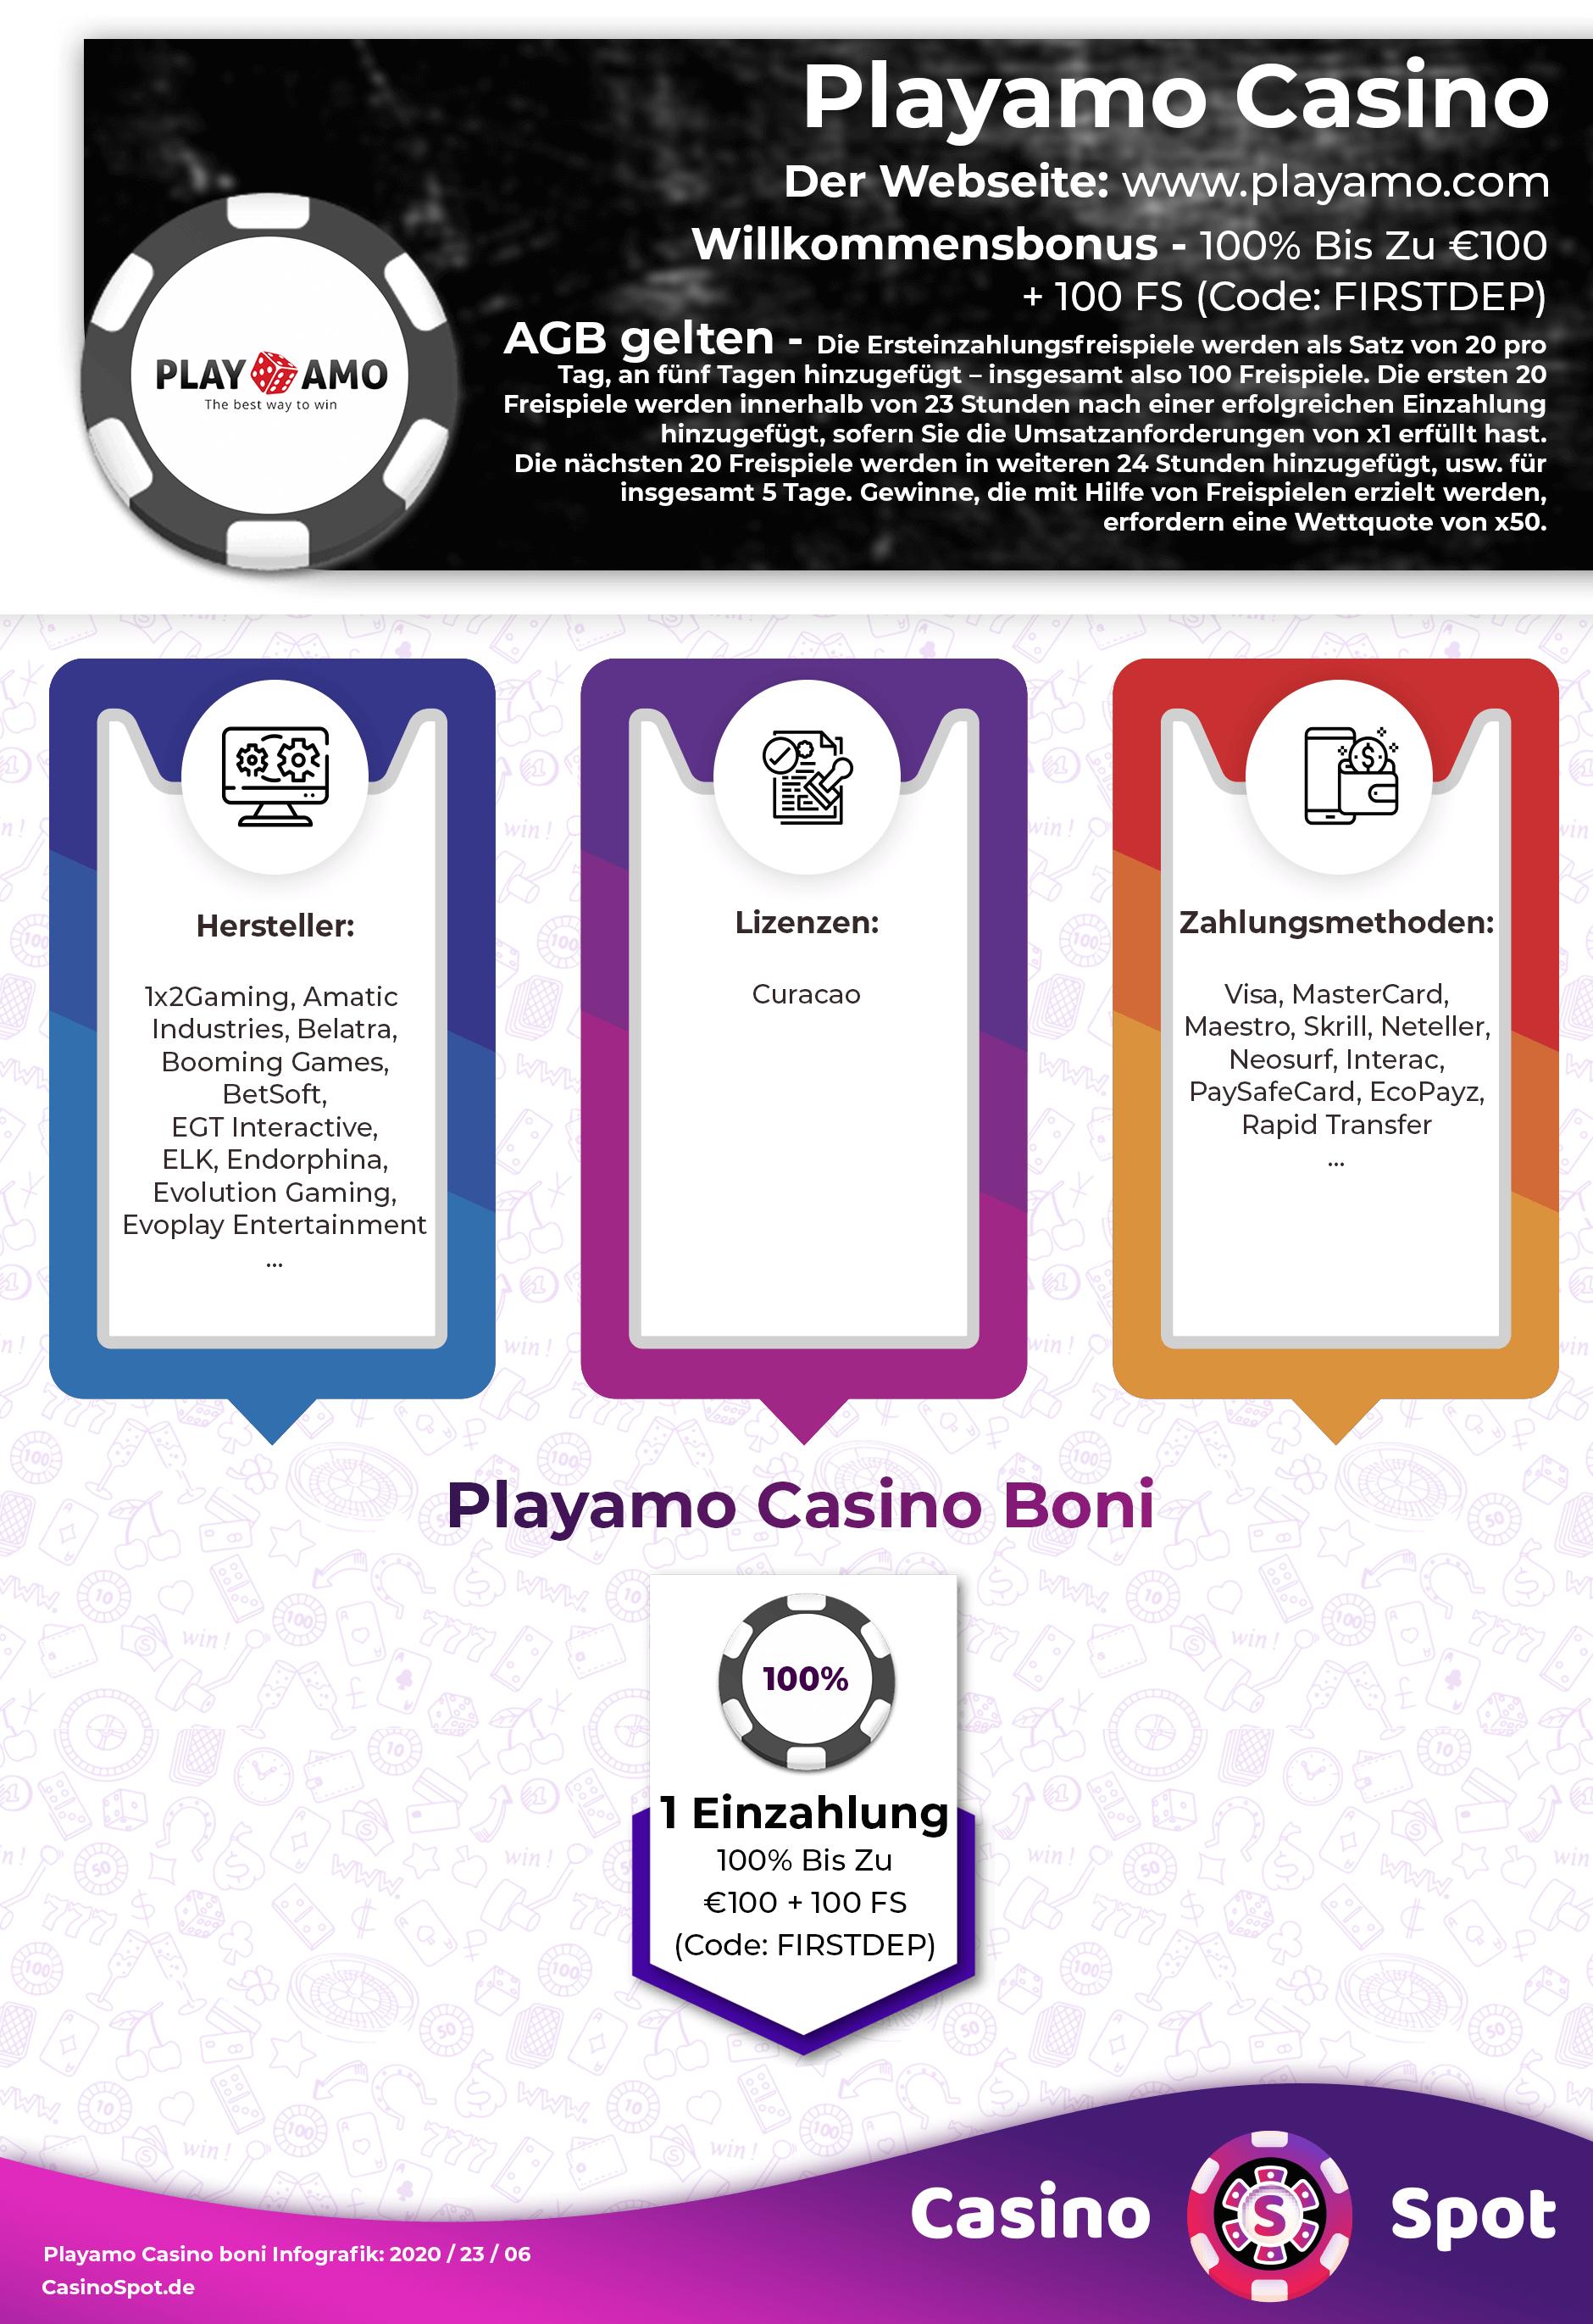 PlayAmo Casino Bonus Codes 2021